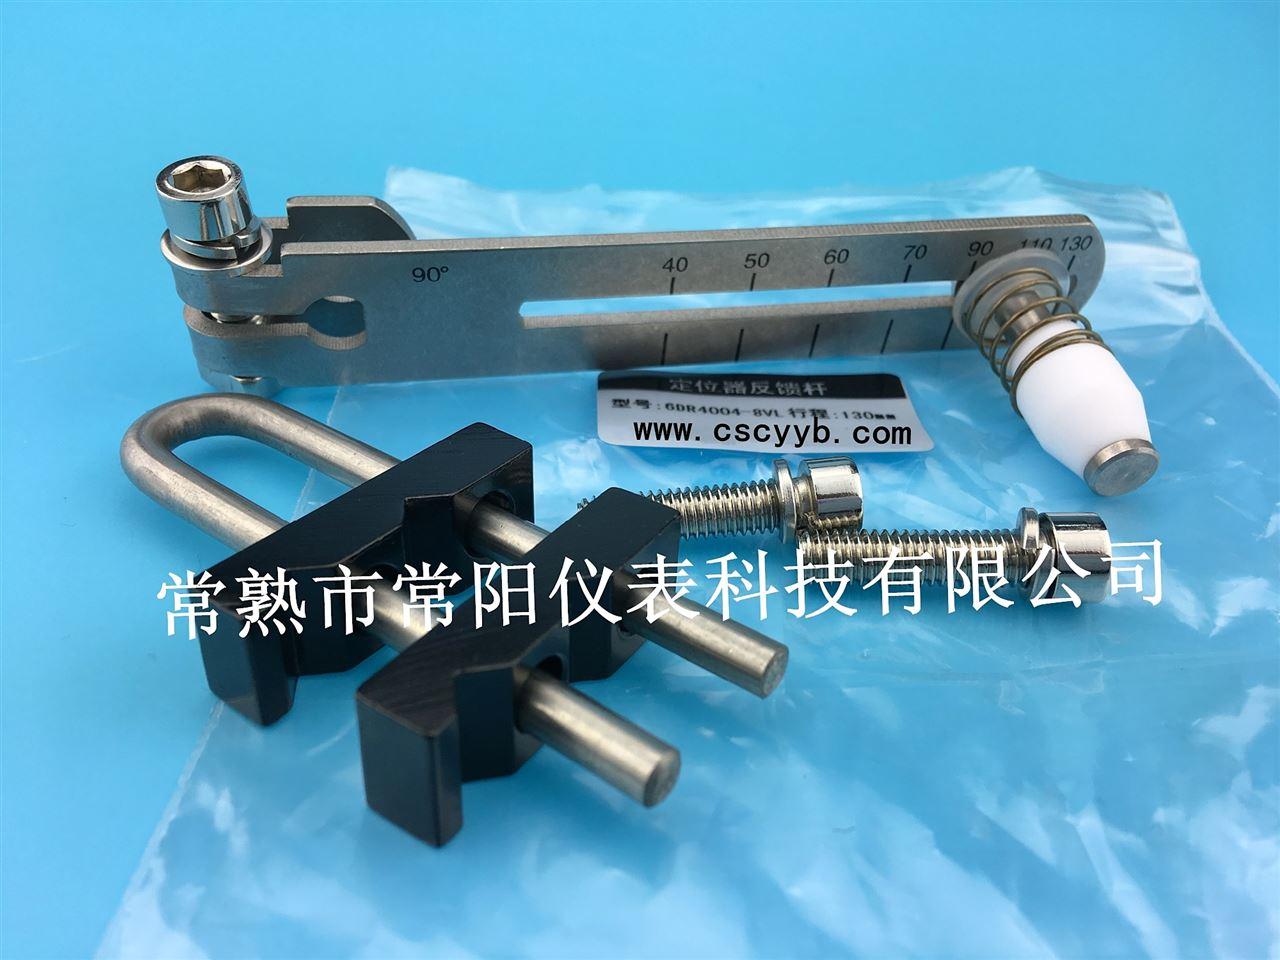 <strong>6DR4004-8VL直行程反馈杆,西门子安装附件</strong>